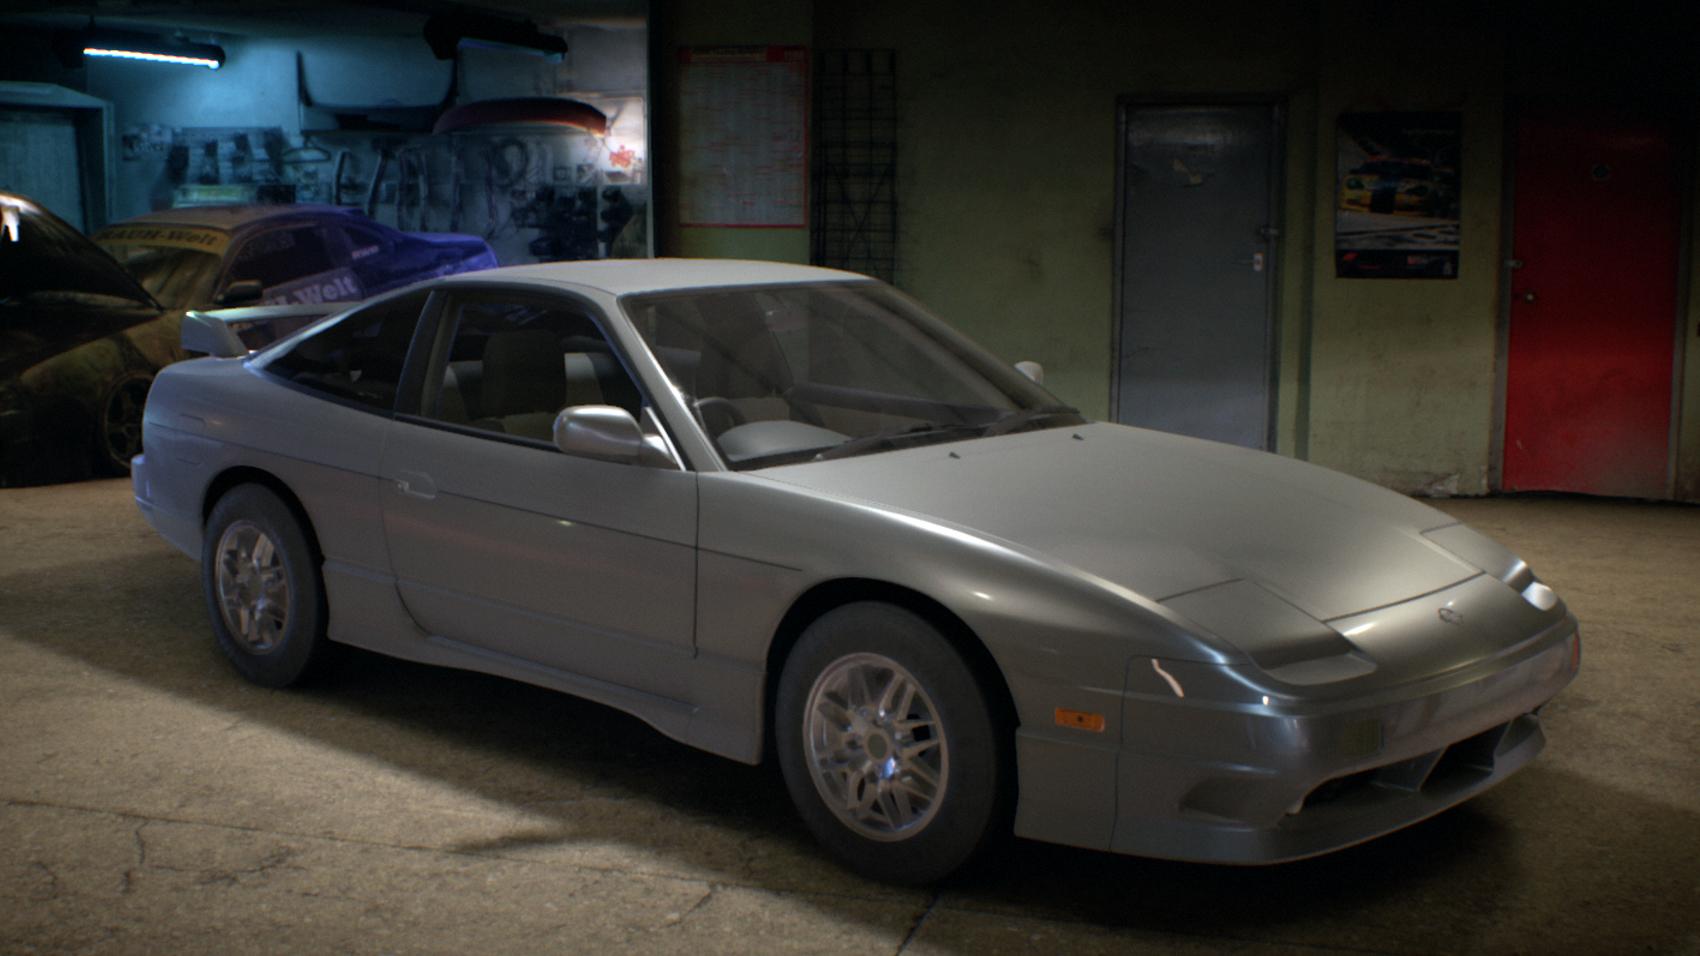 Nissan 180SX (S13) | Need for Speed Wiki | FANDOM powered by Wikia